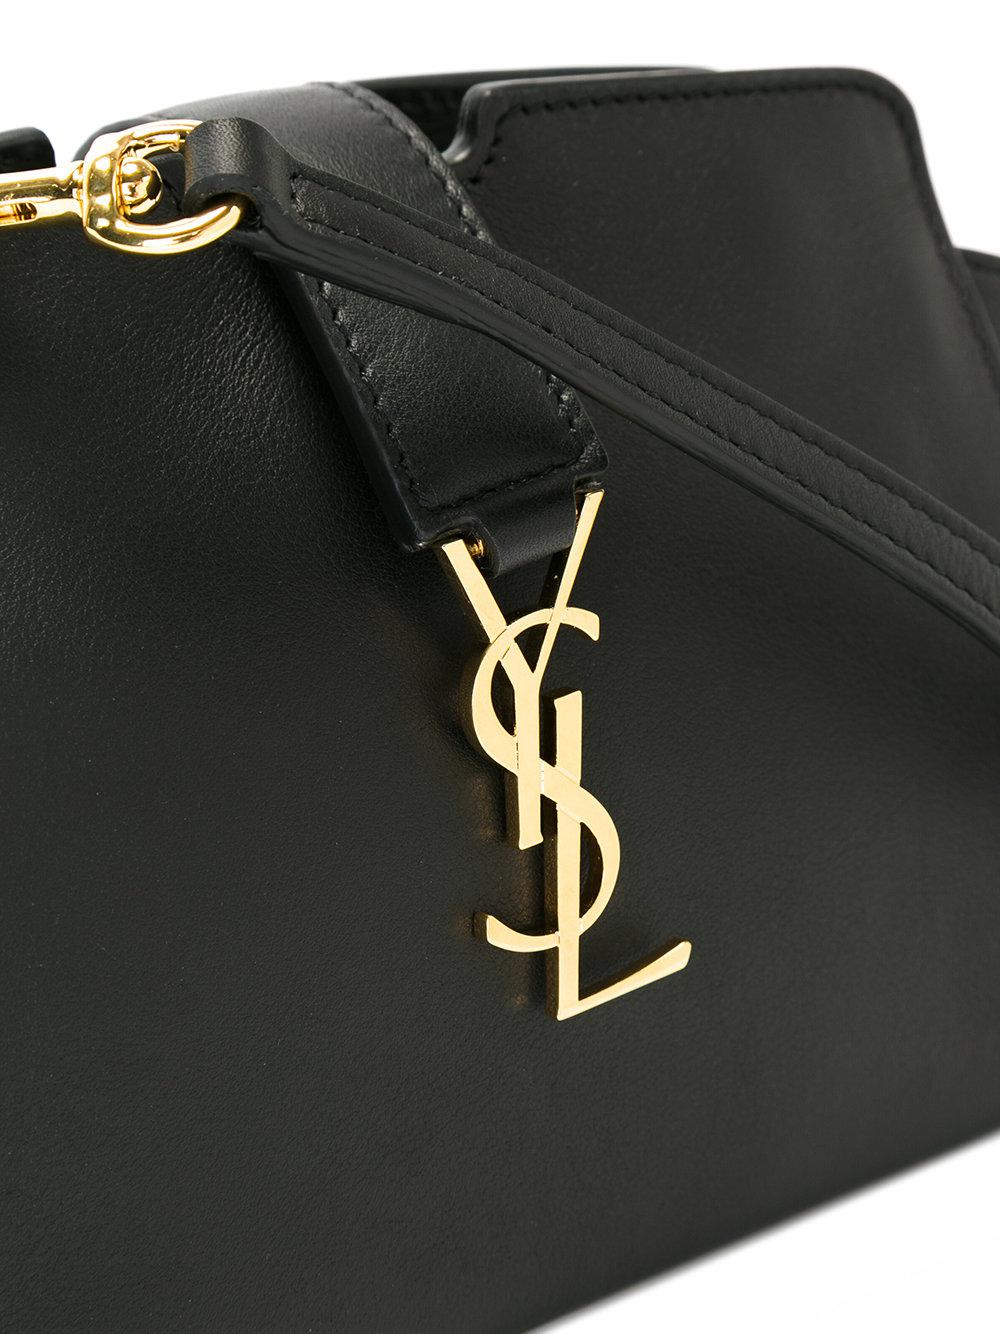 Lyst Saint Laurent Toy Ysl Cabas Crossbody Bag In Black